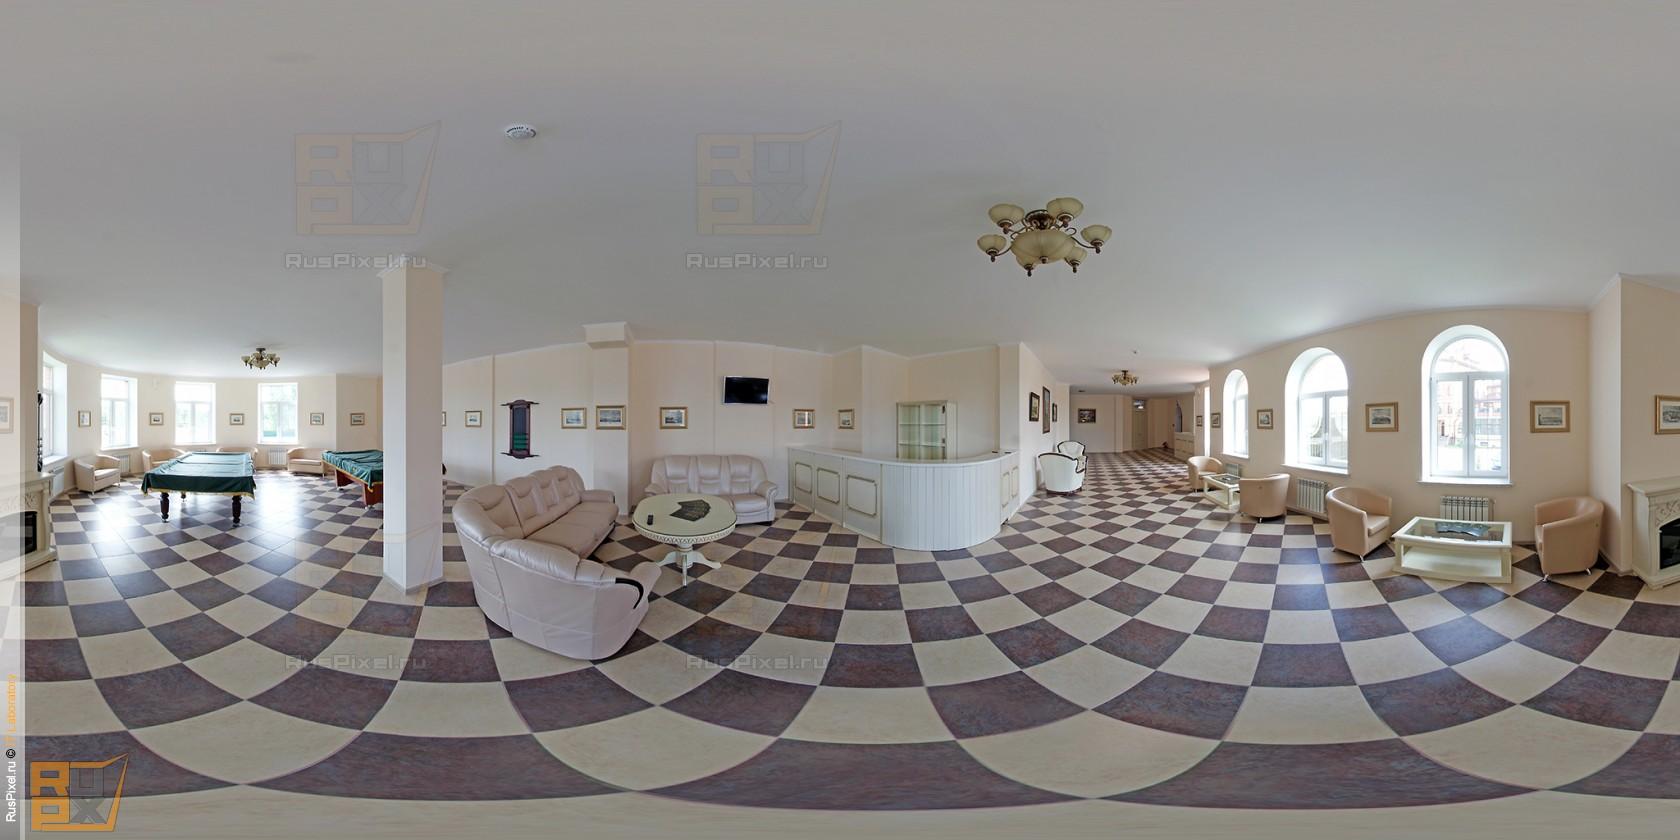 Фотопанорама в 360 градусов